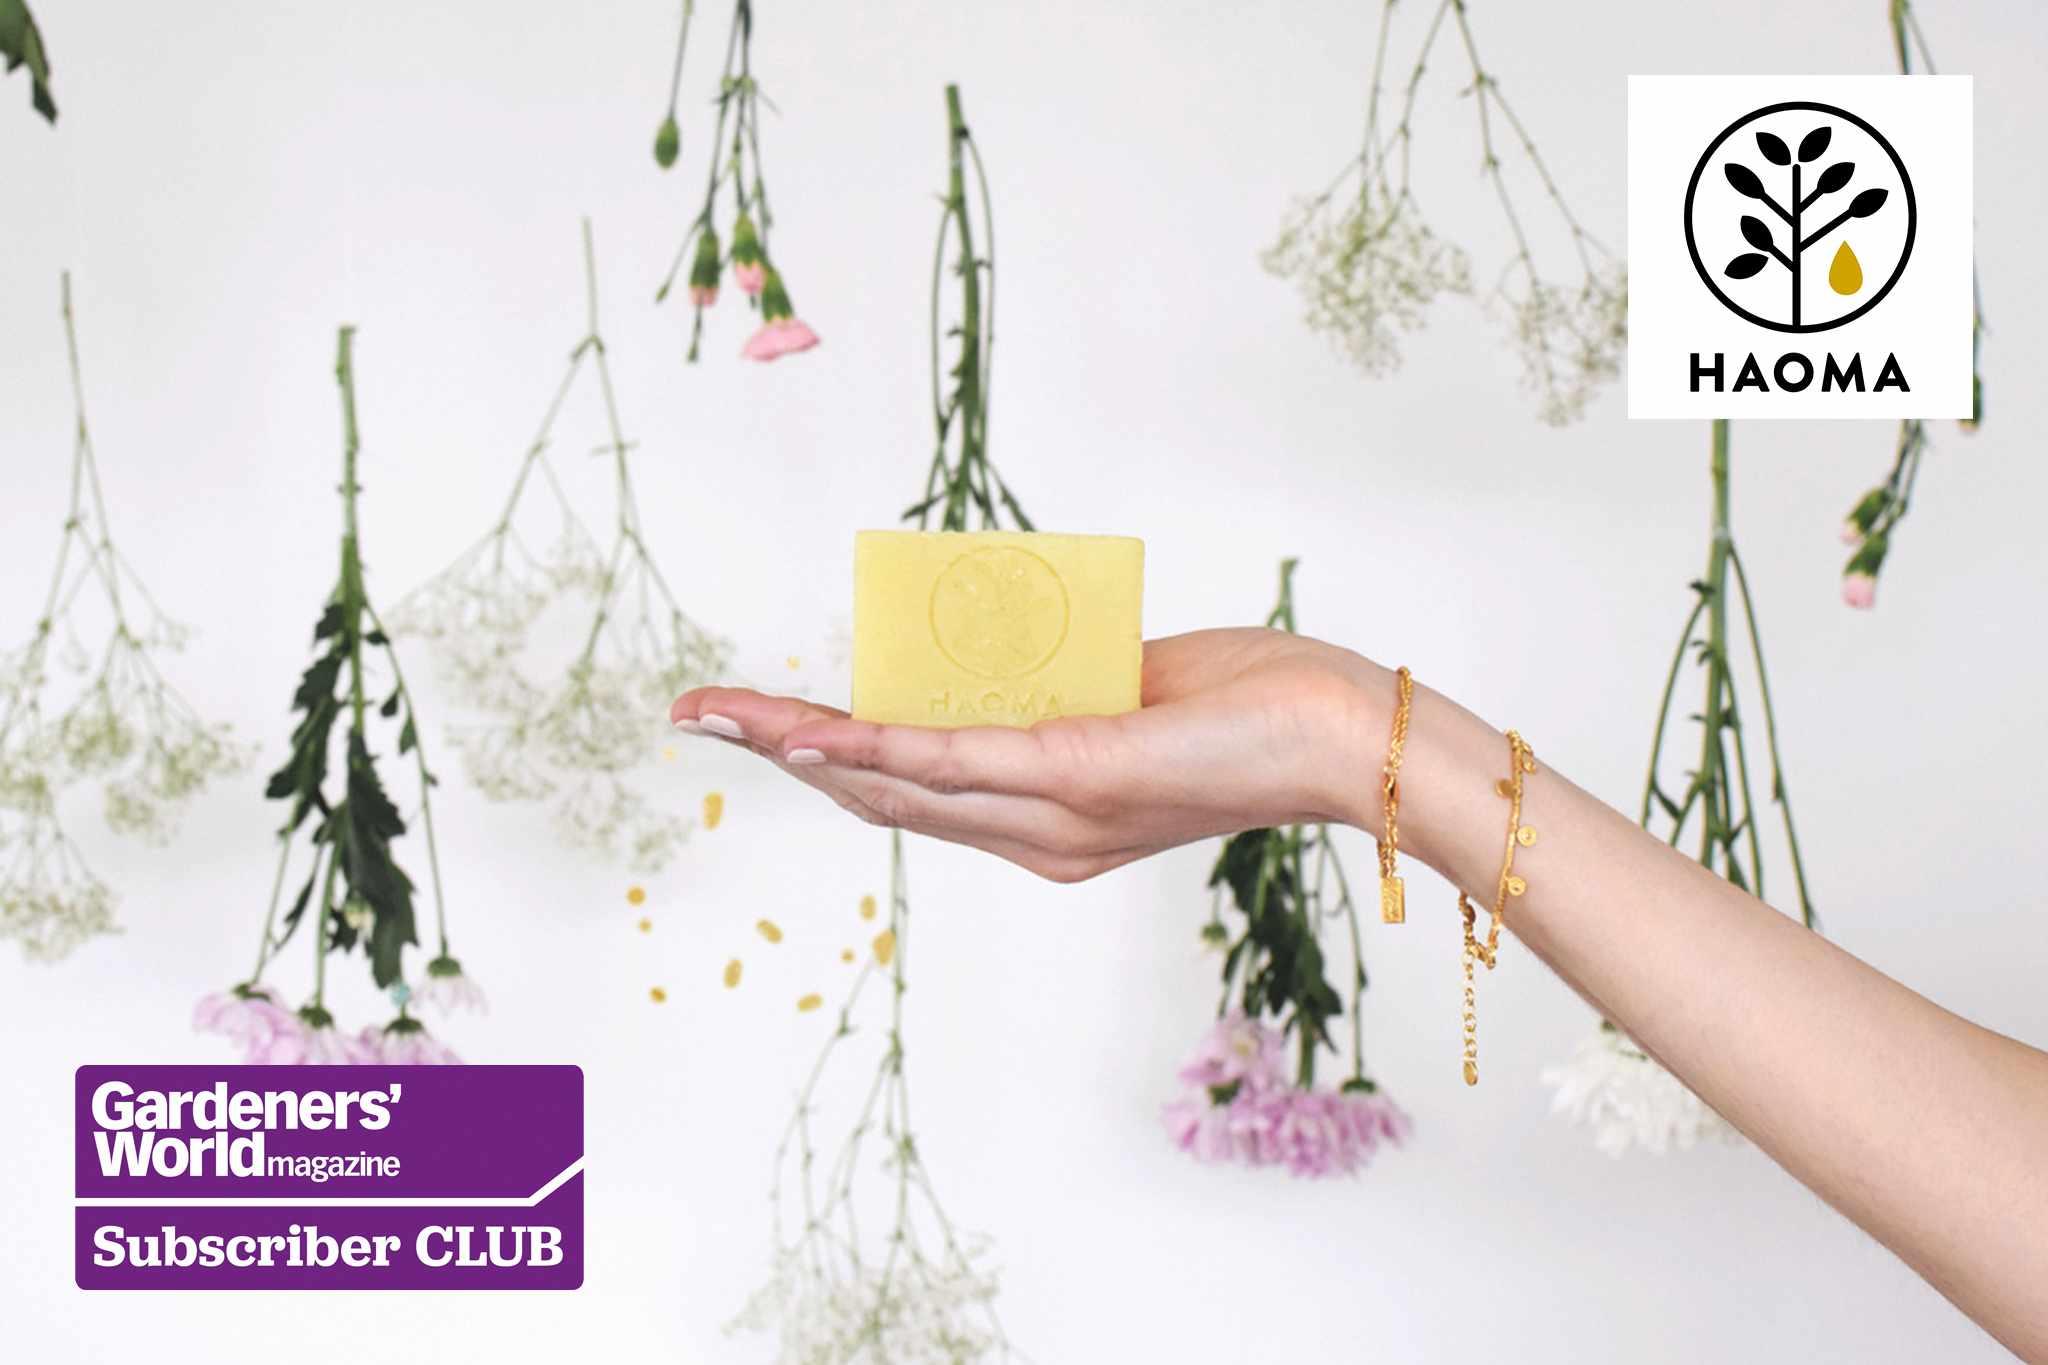 Win an organic beauty bundle from Haoma - BBC Gardeners' World Magazine